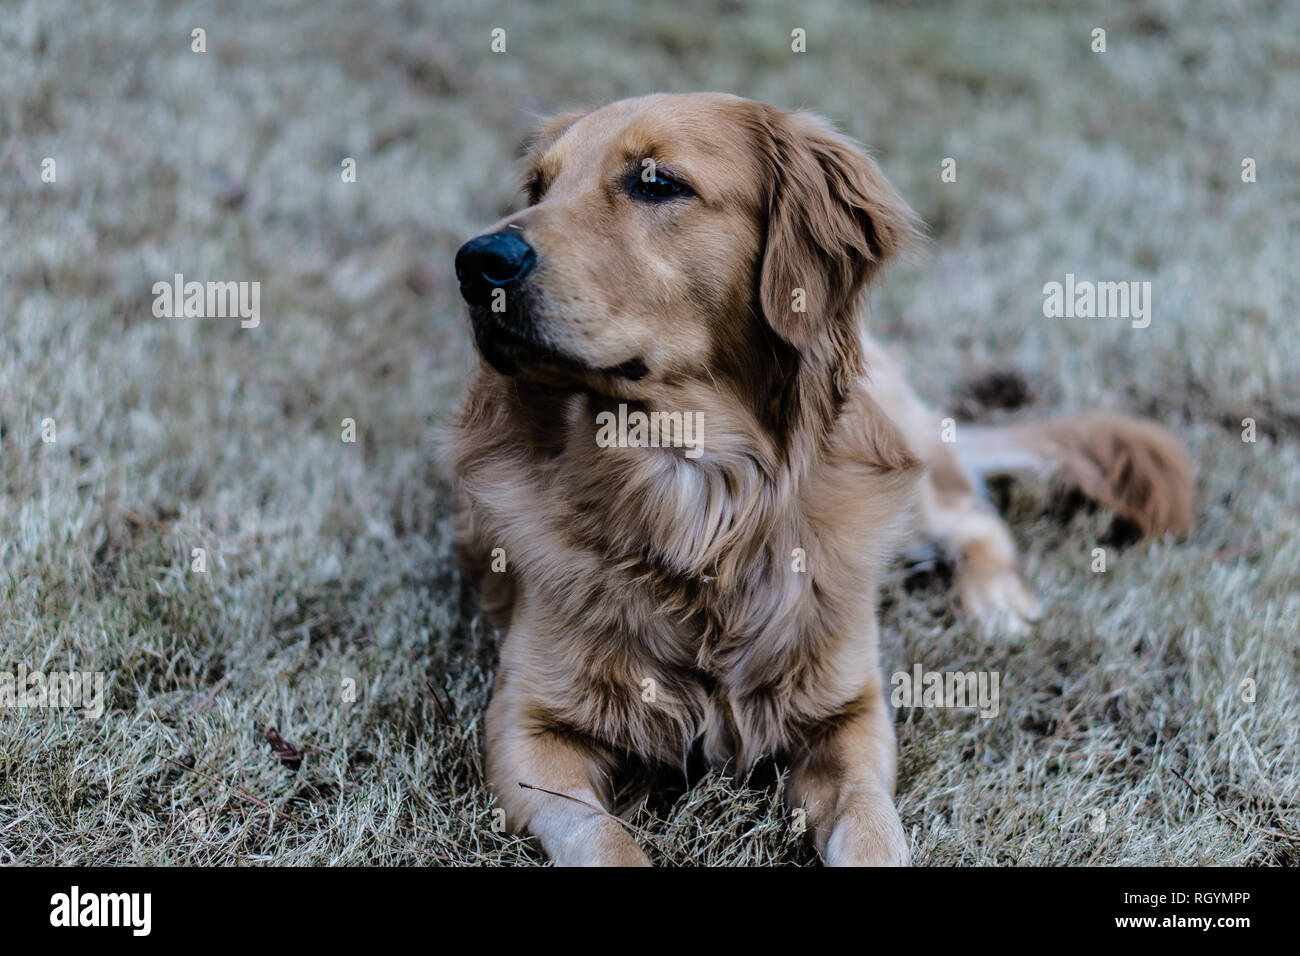 Beautiful young Golden Retriever enjoying ain the park - Stock Image